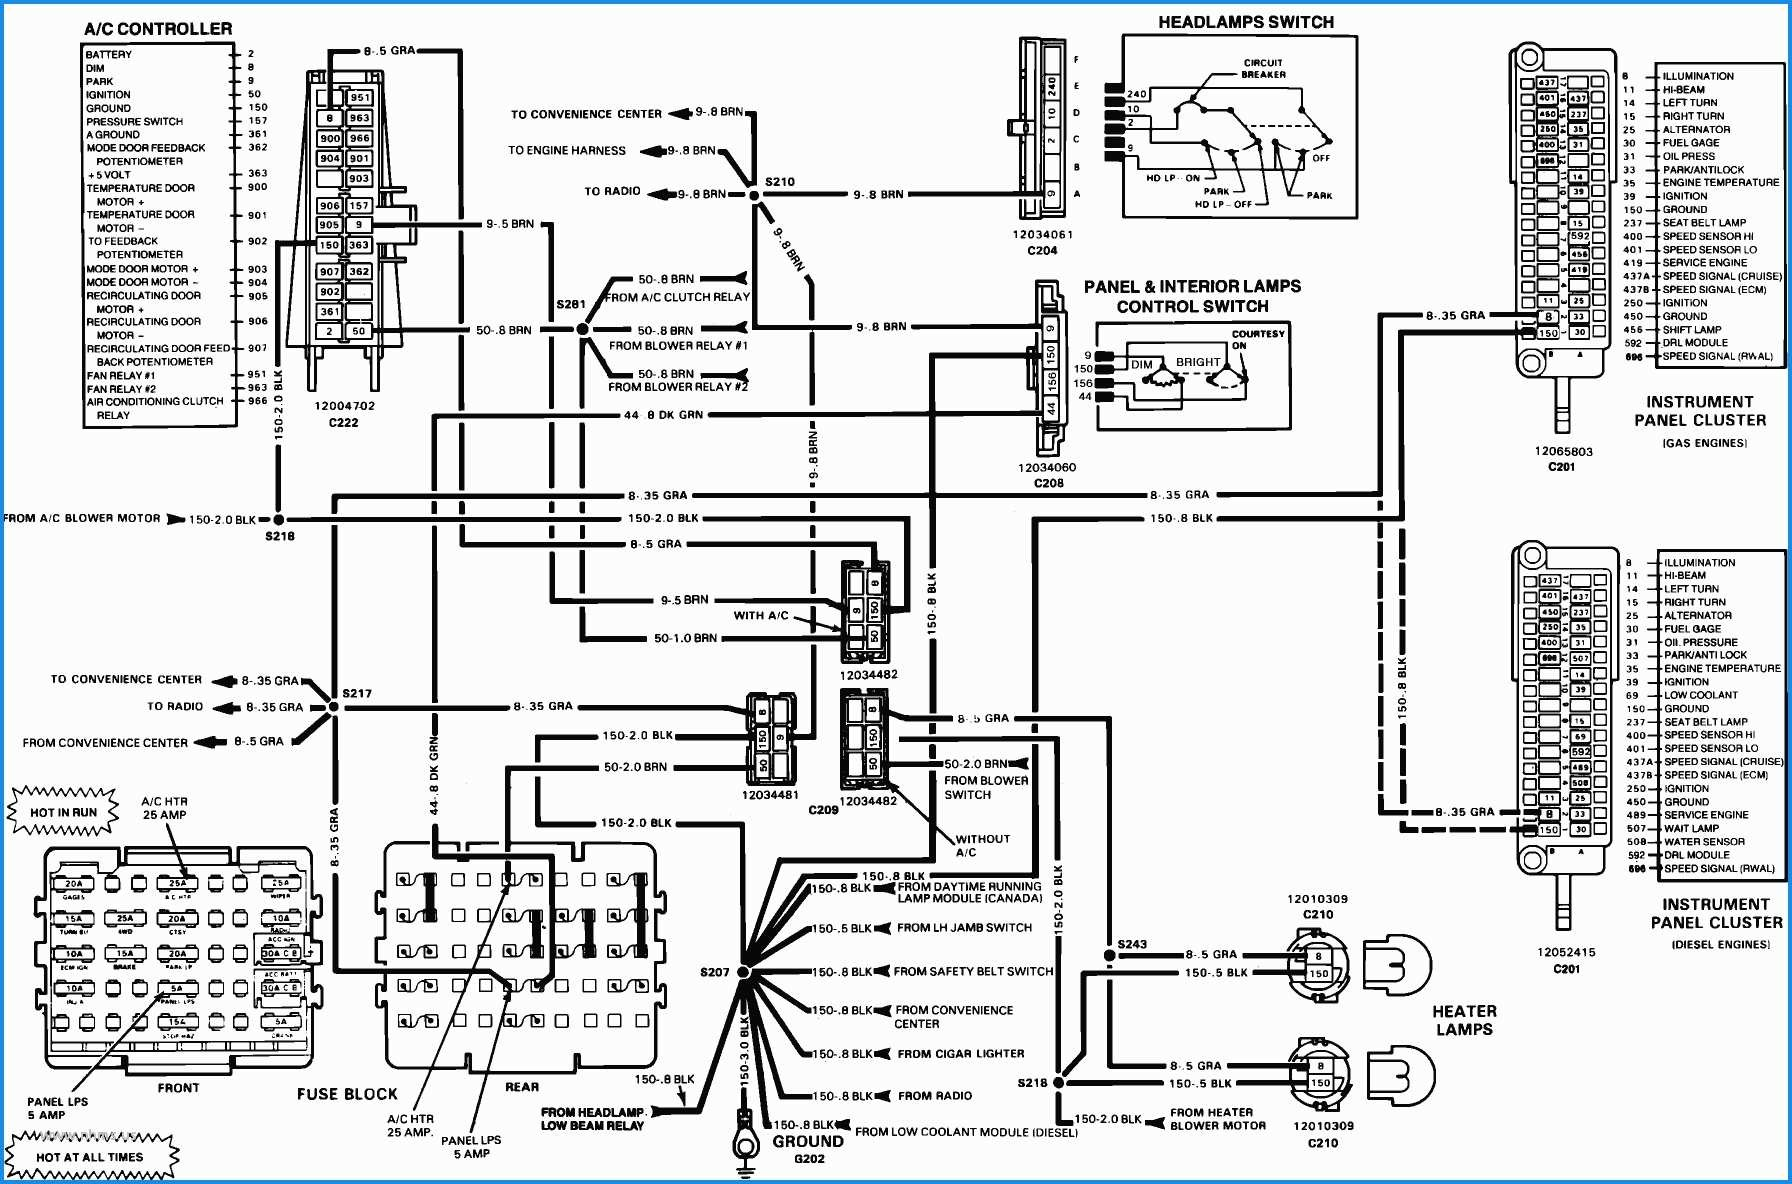 Wiring A 1985 Chevy Stering Coloumn Diagram] 1984 Gmc High Sierra Wiring Diagram Full Version Hd Of Wiring A 1985 Chevy Stering Coloumn